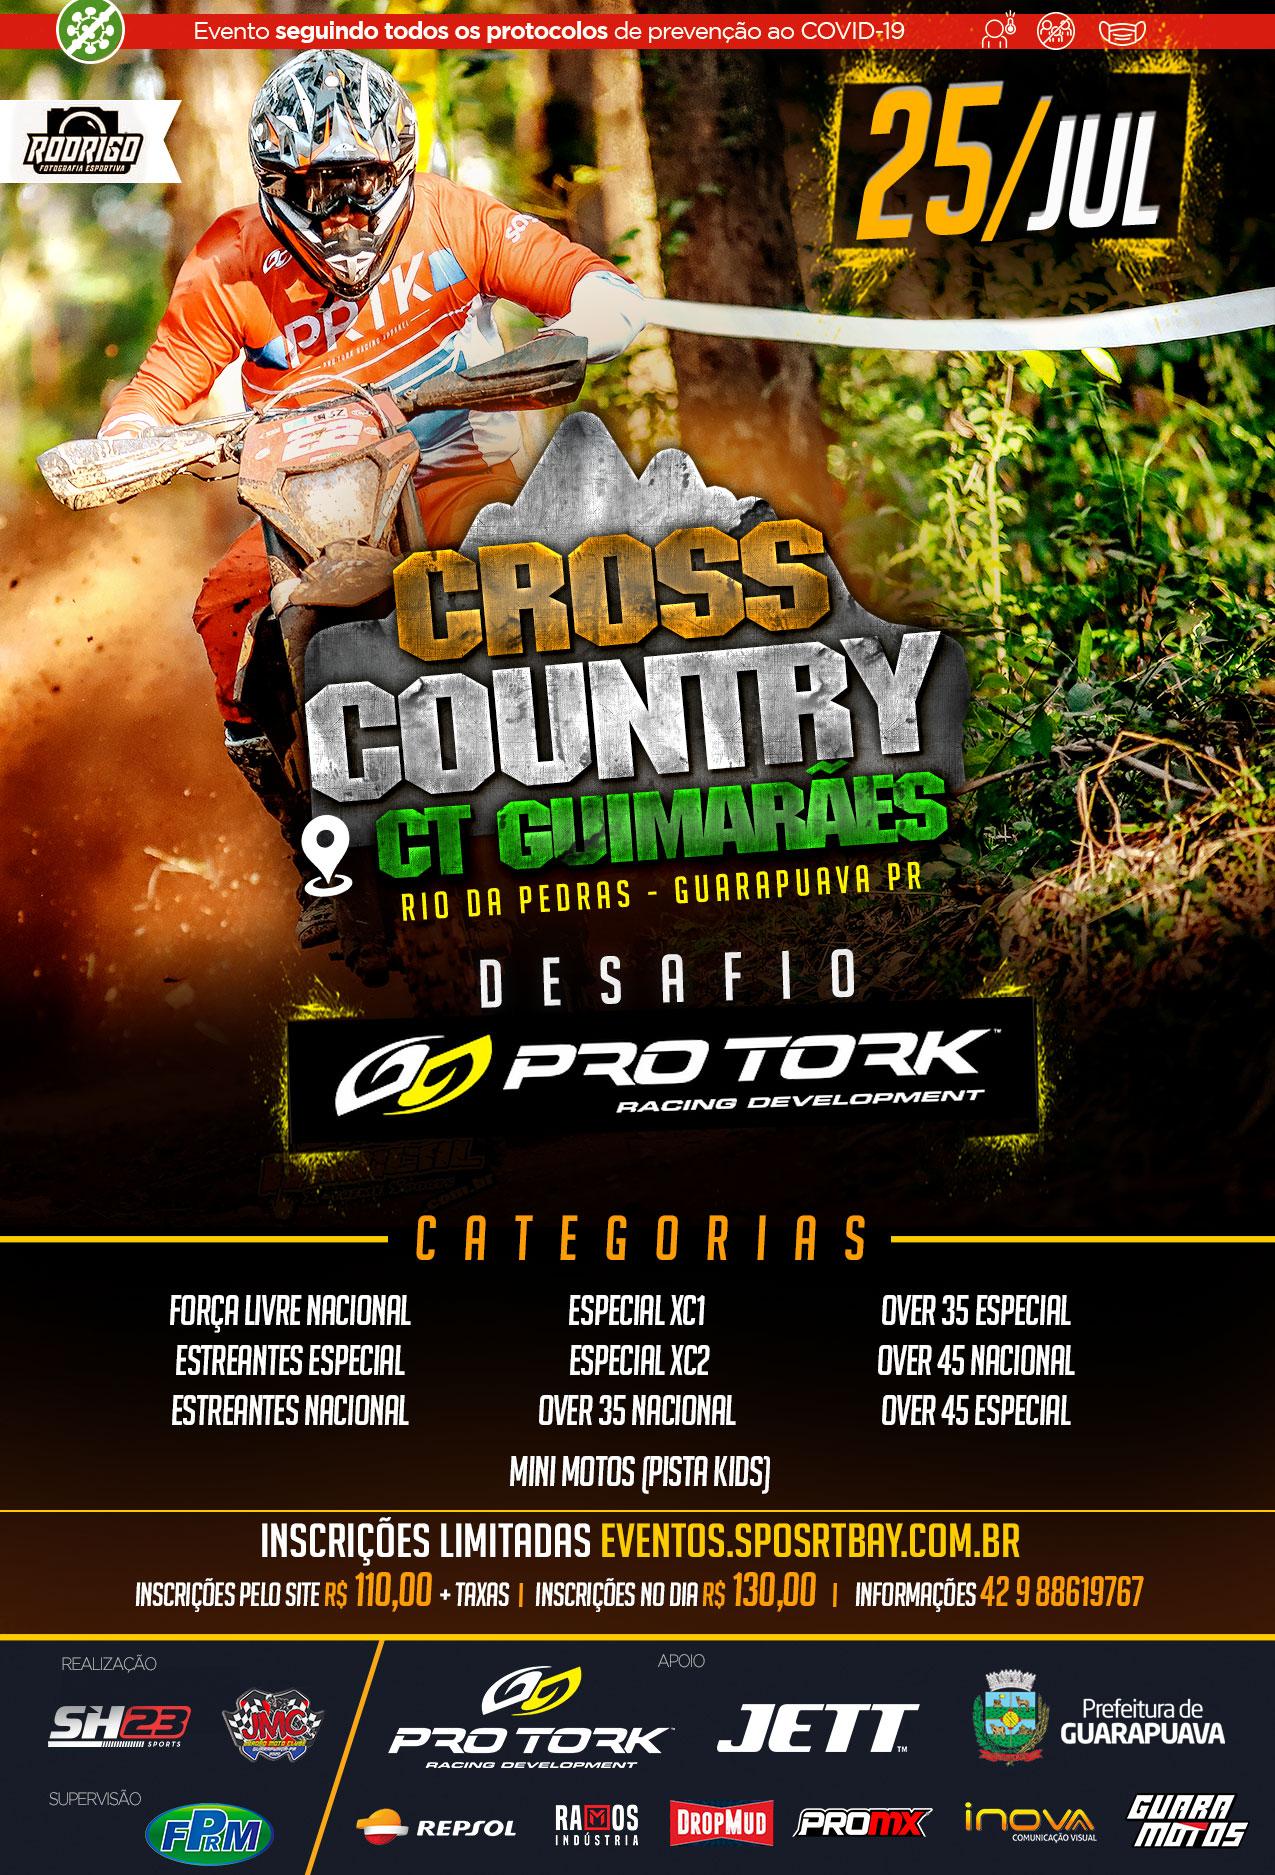 Desafio Pro Tork de Cross Country